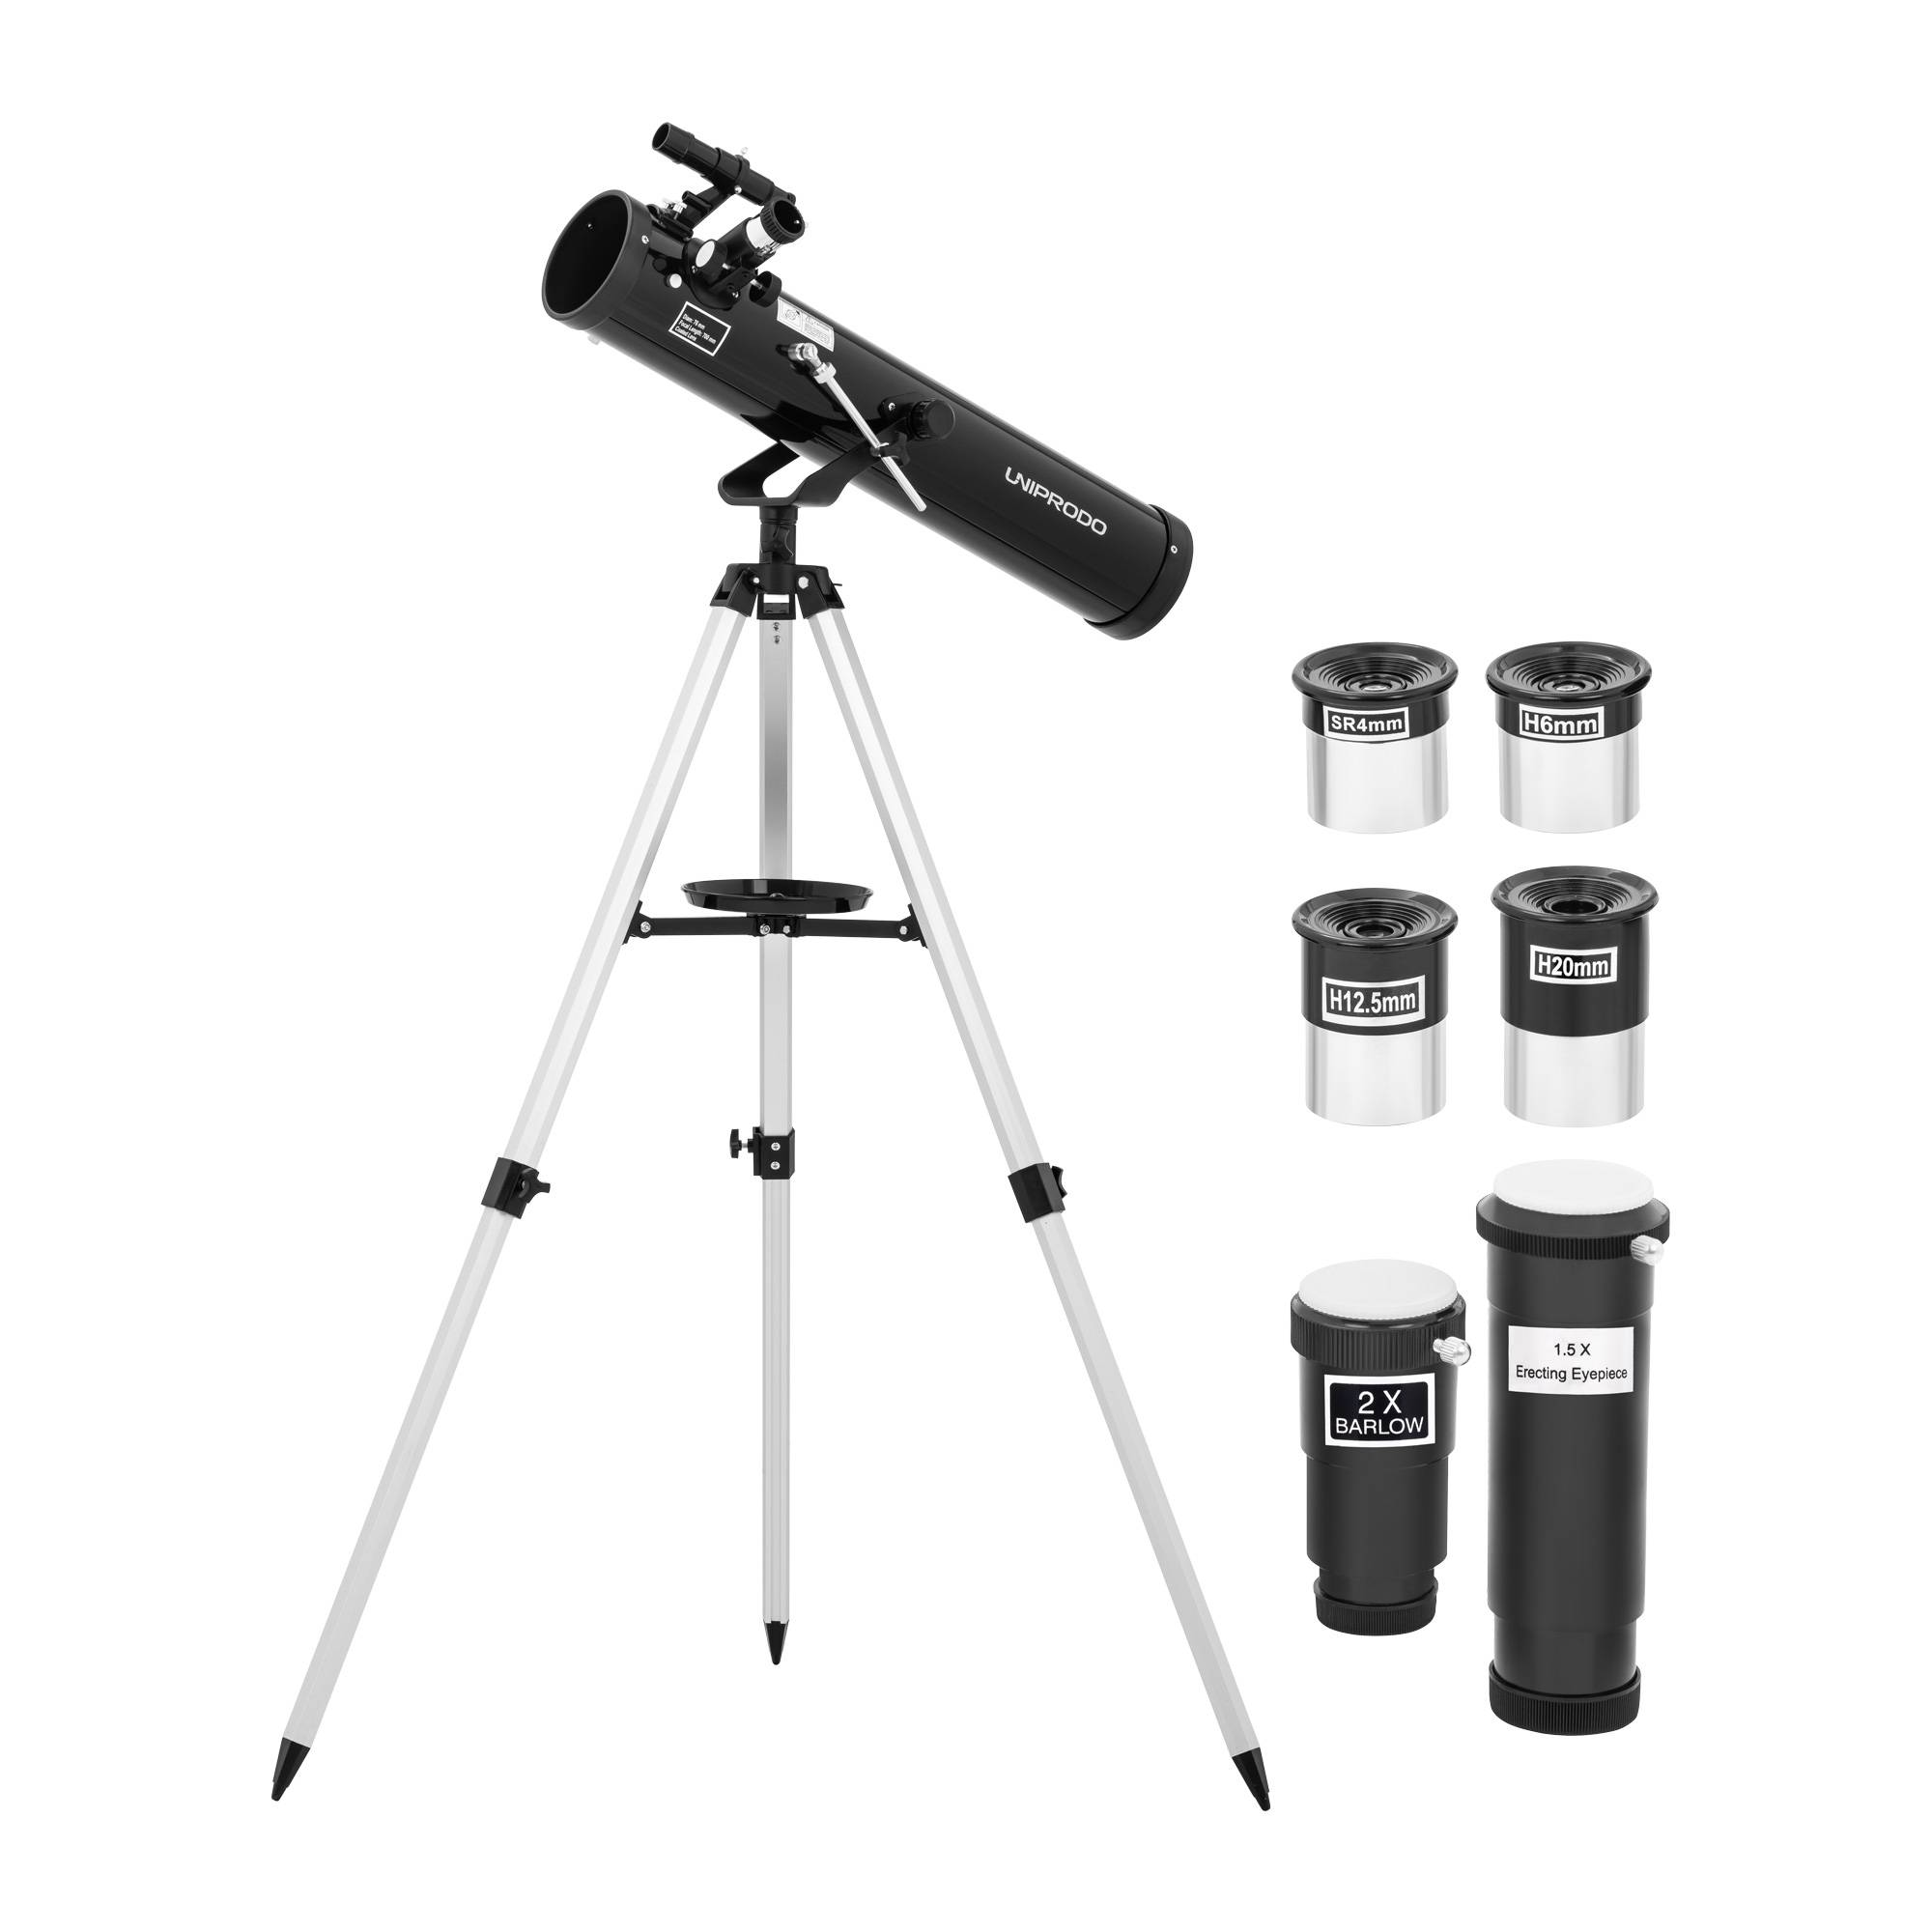 Uniprodo Teleskop - Ø 76 mm - 900 mm - stativ 10250357